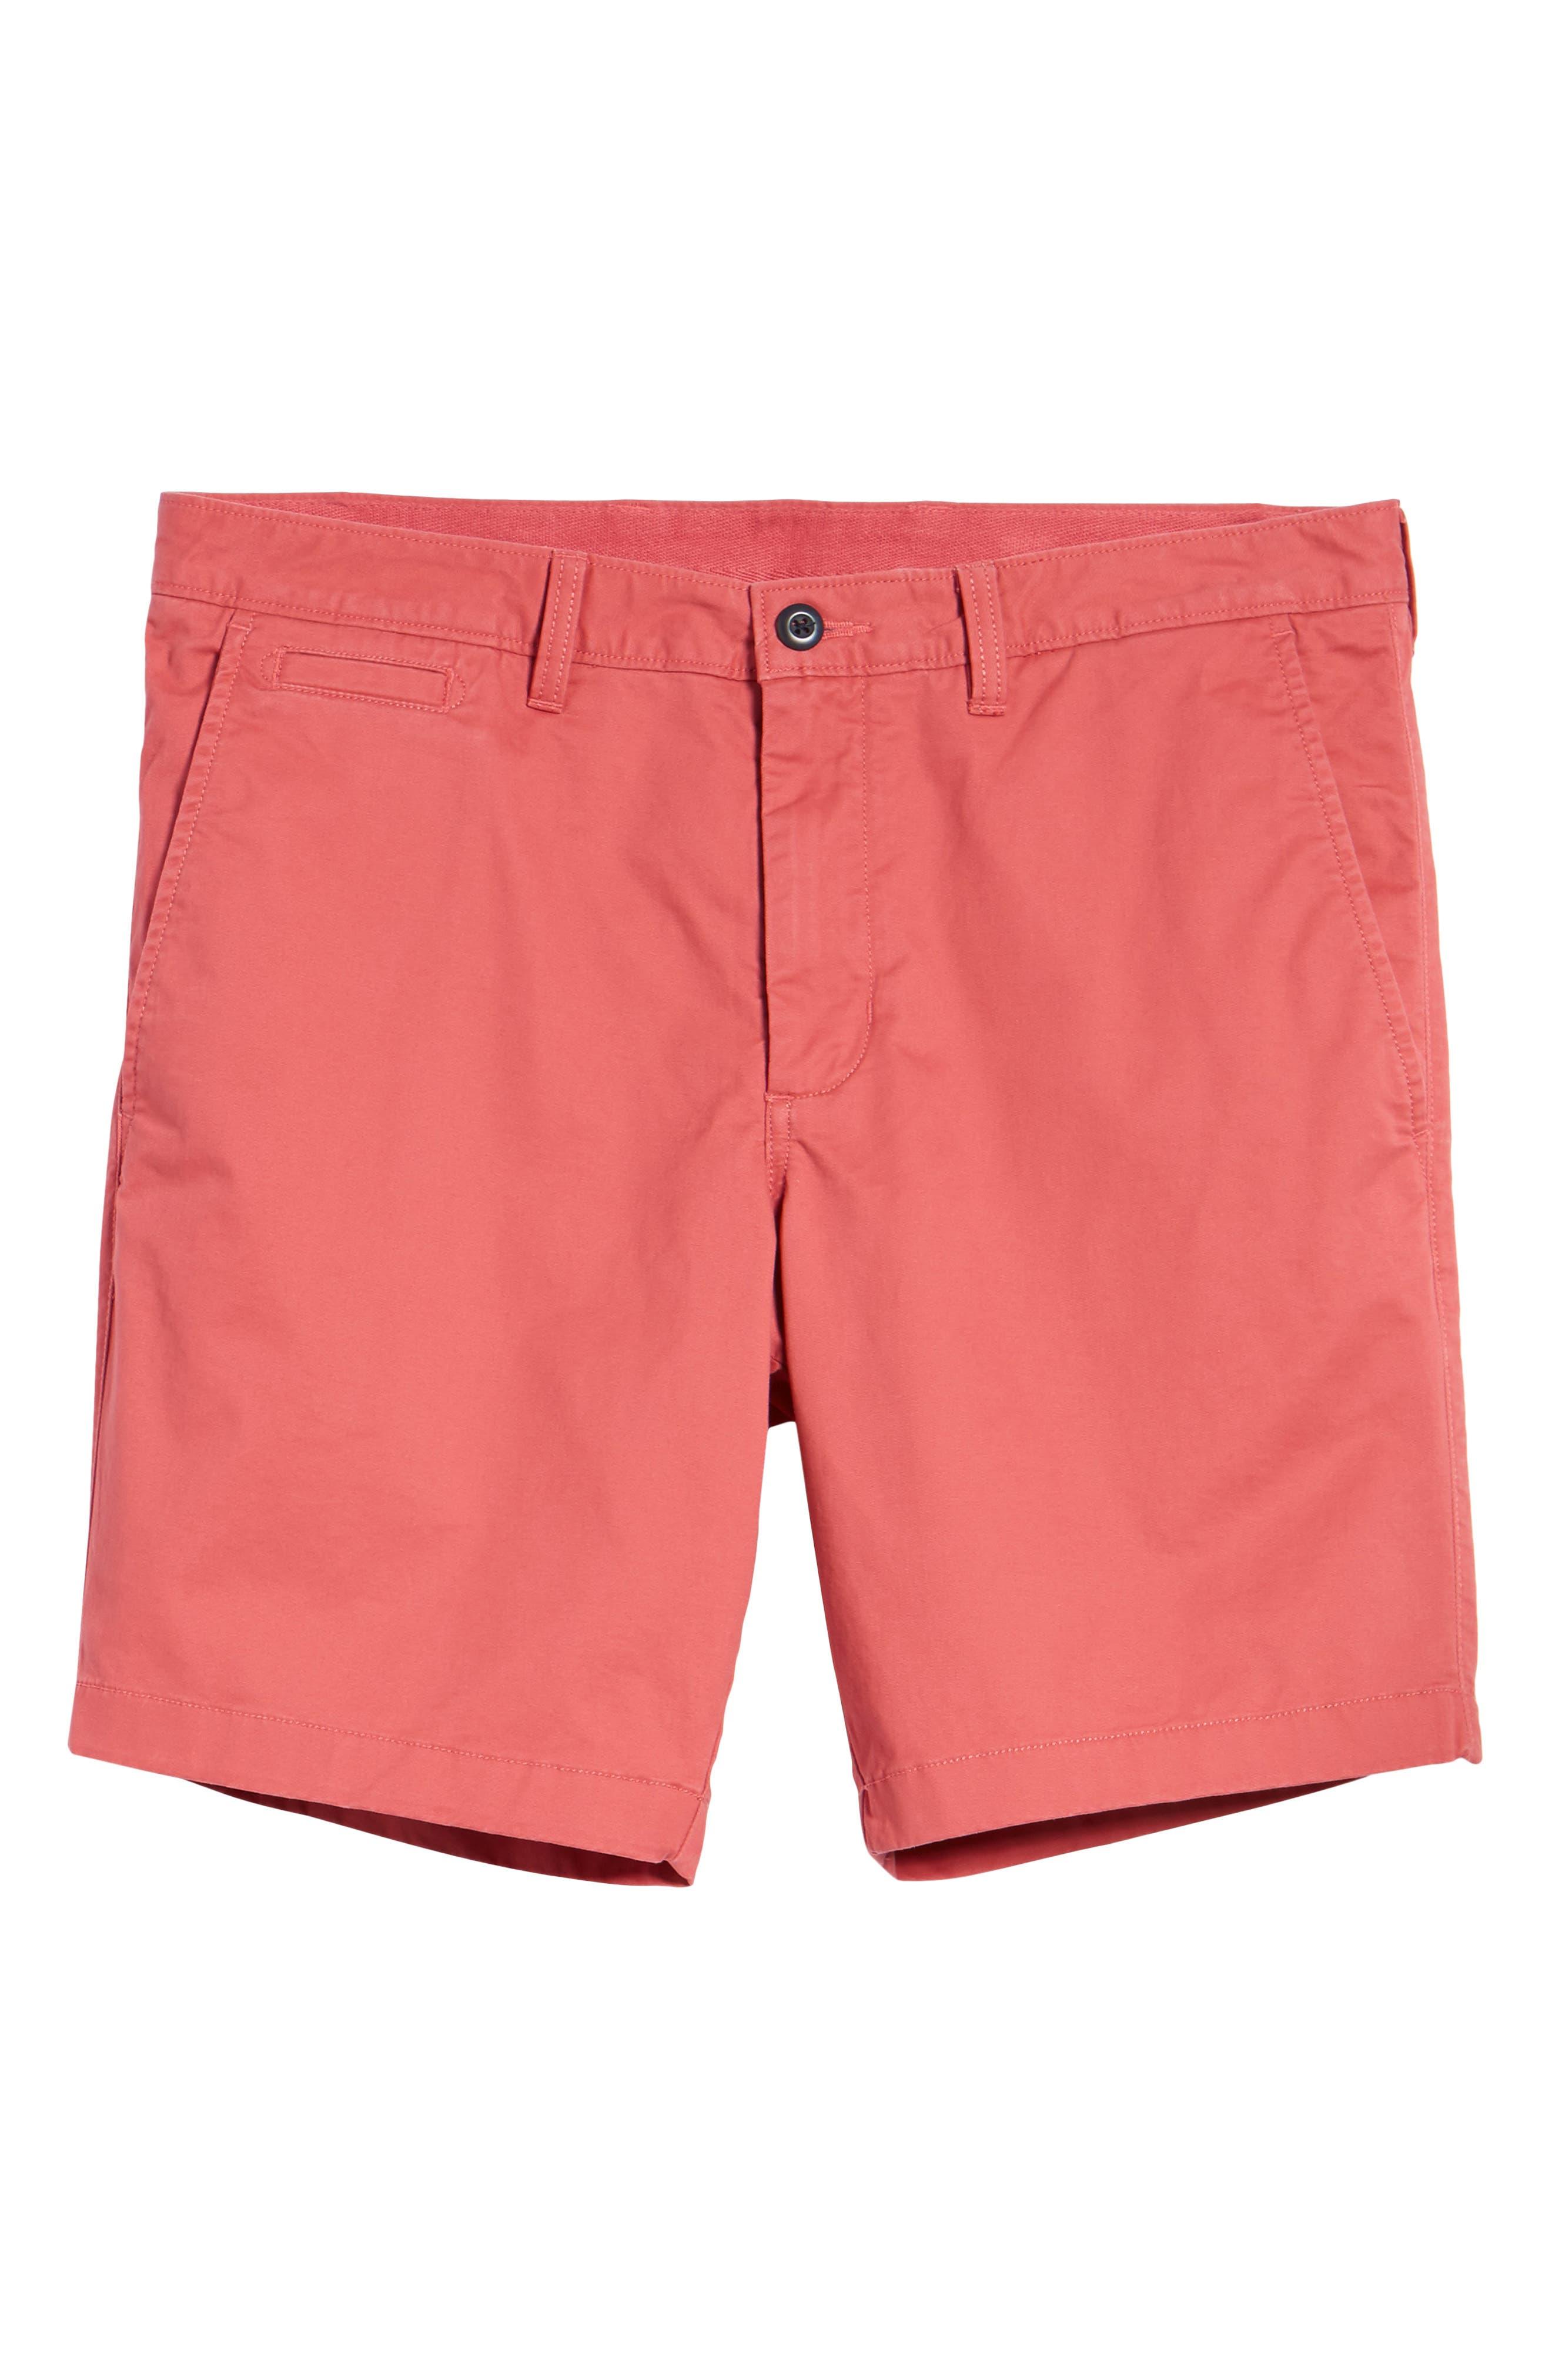 Ballard Slim Fit Stretch Chino 9-Inch Shorts,                             Alternate thumbnail 71, color,